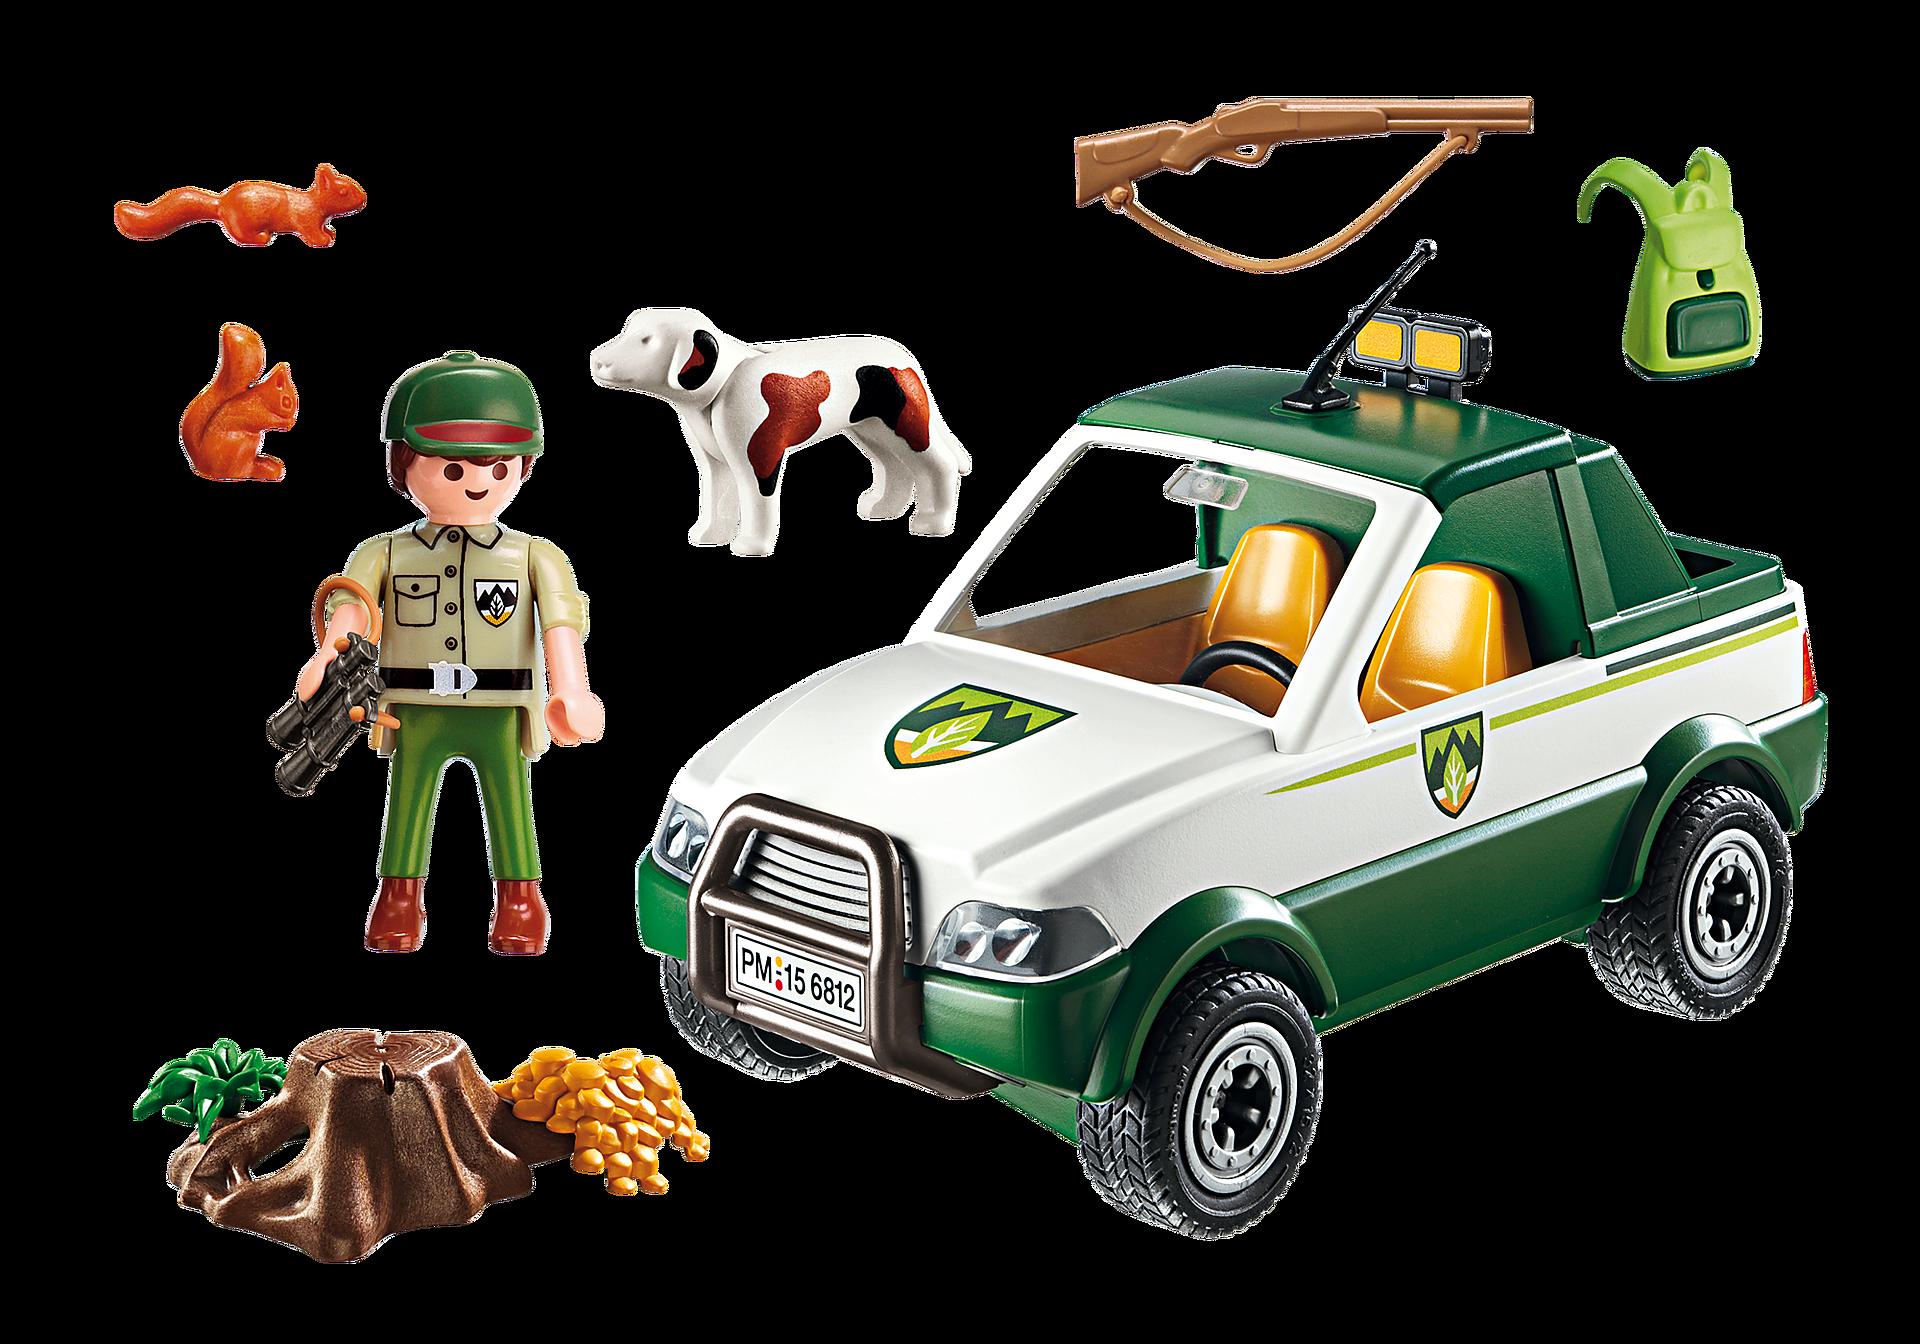 6812 Garde forestier avec pick-up zoom image4